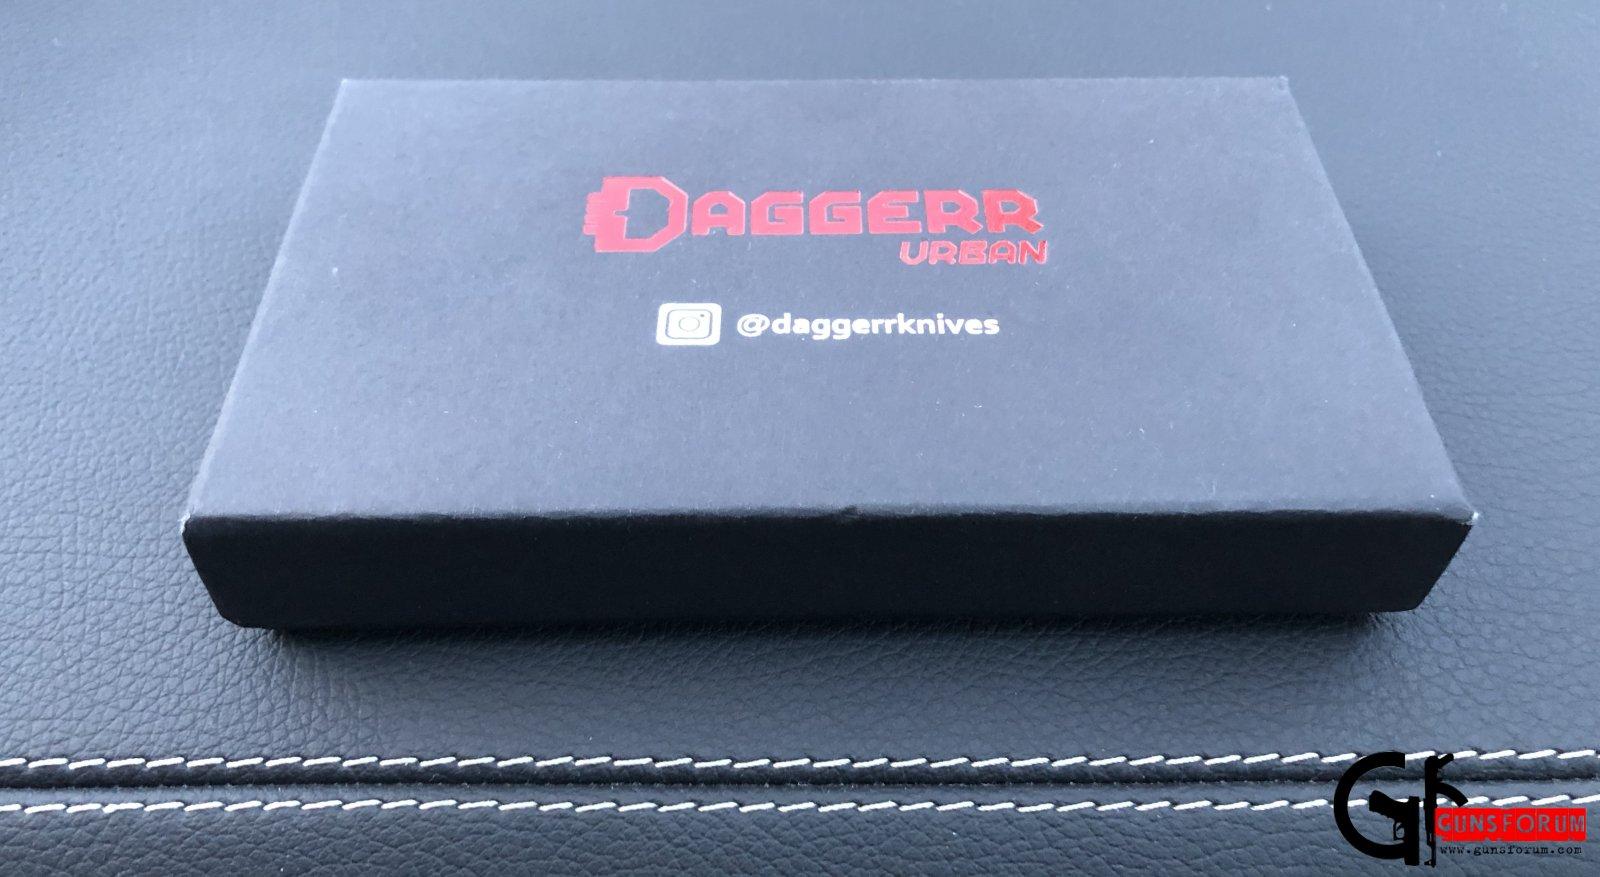 Daggerr Urban